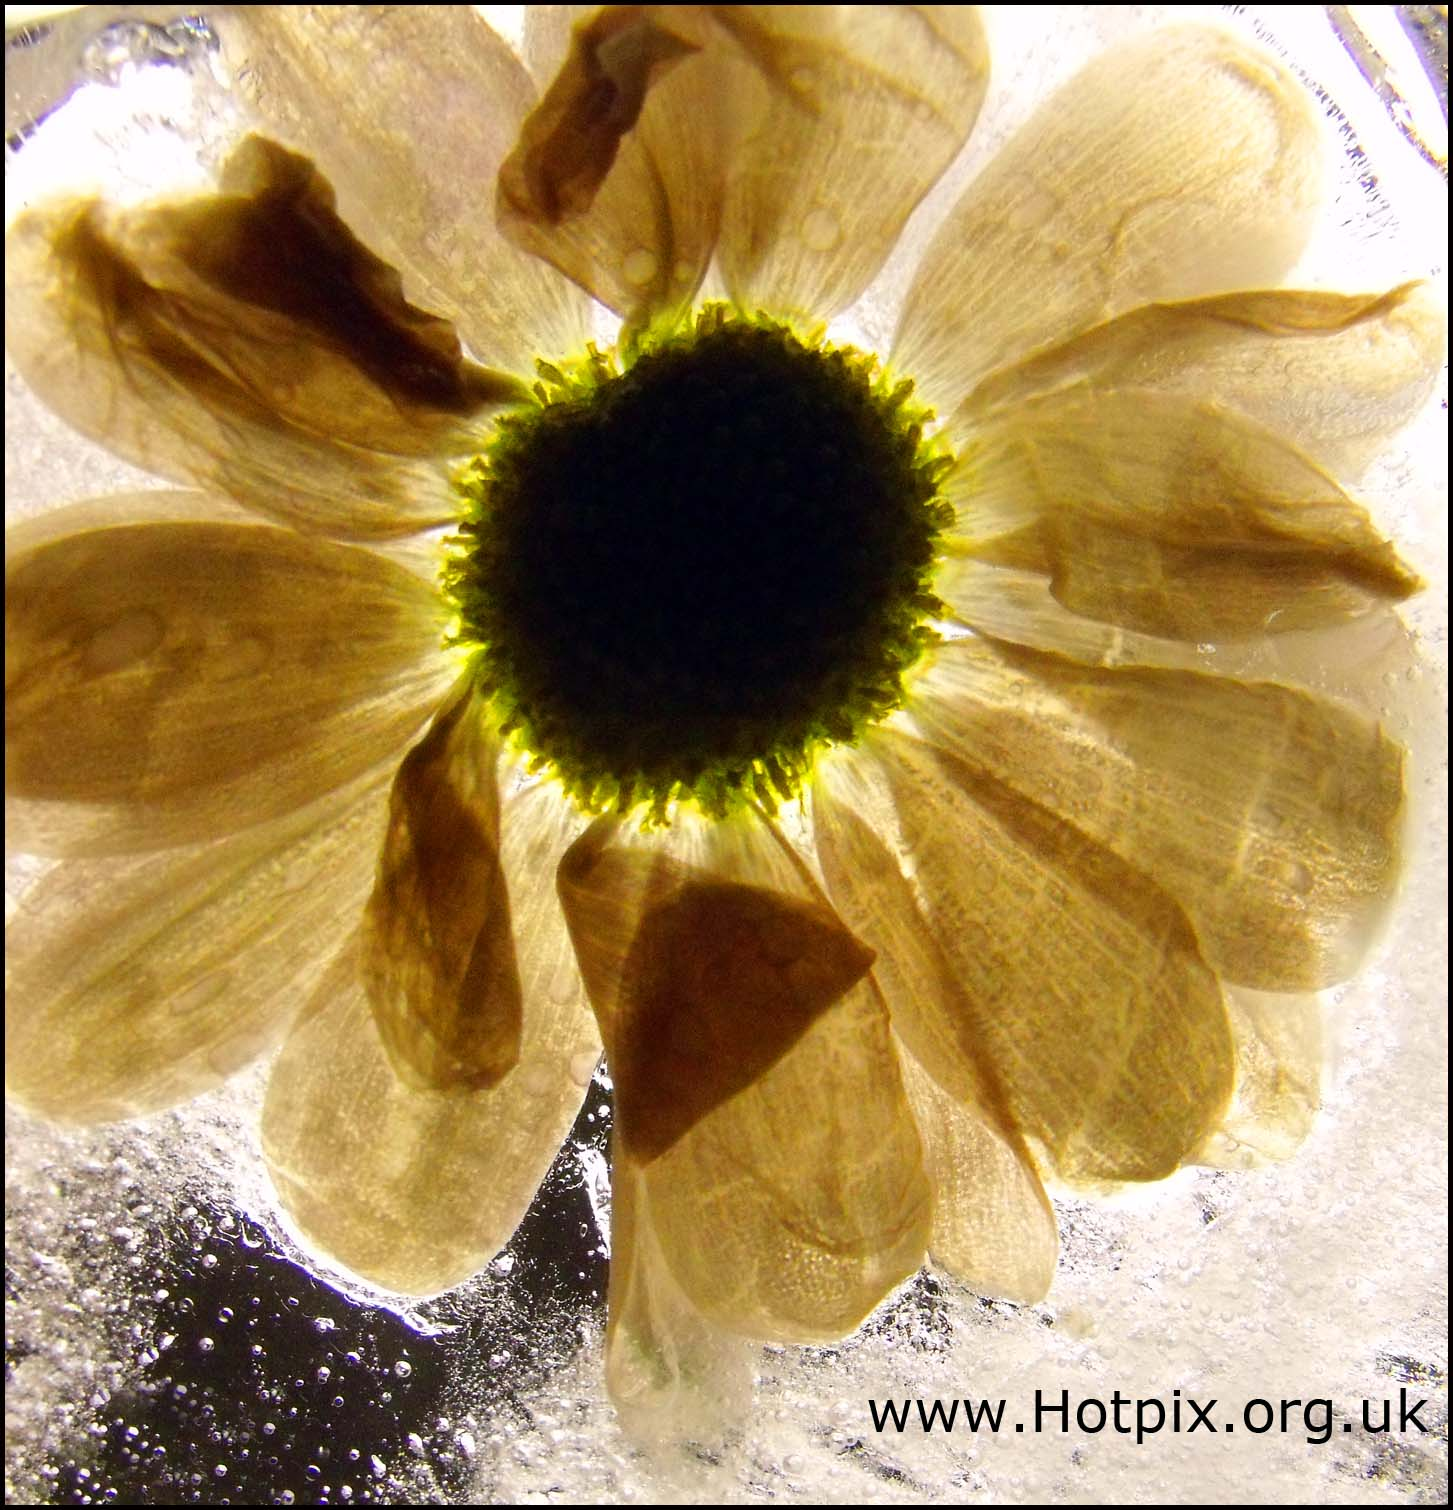 flower,ice,iced,frozen,solid,northwich,cheshire,england,uk,gb,january,2010,winter,weather,hotpixuk,hotpix,tony,smith,tonysmith,tdk,tdktony,yellow,macro,small,close,up,closeup,cold,colder,nature,natural,history,world,life,this photo rocks,plant,bloom,flowers,flores,blome,stillife,stilllife,still